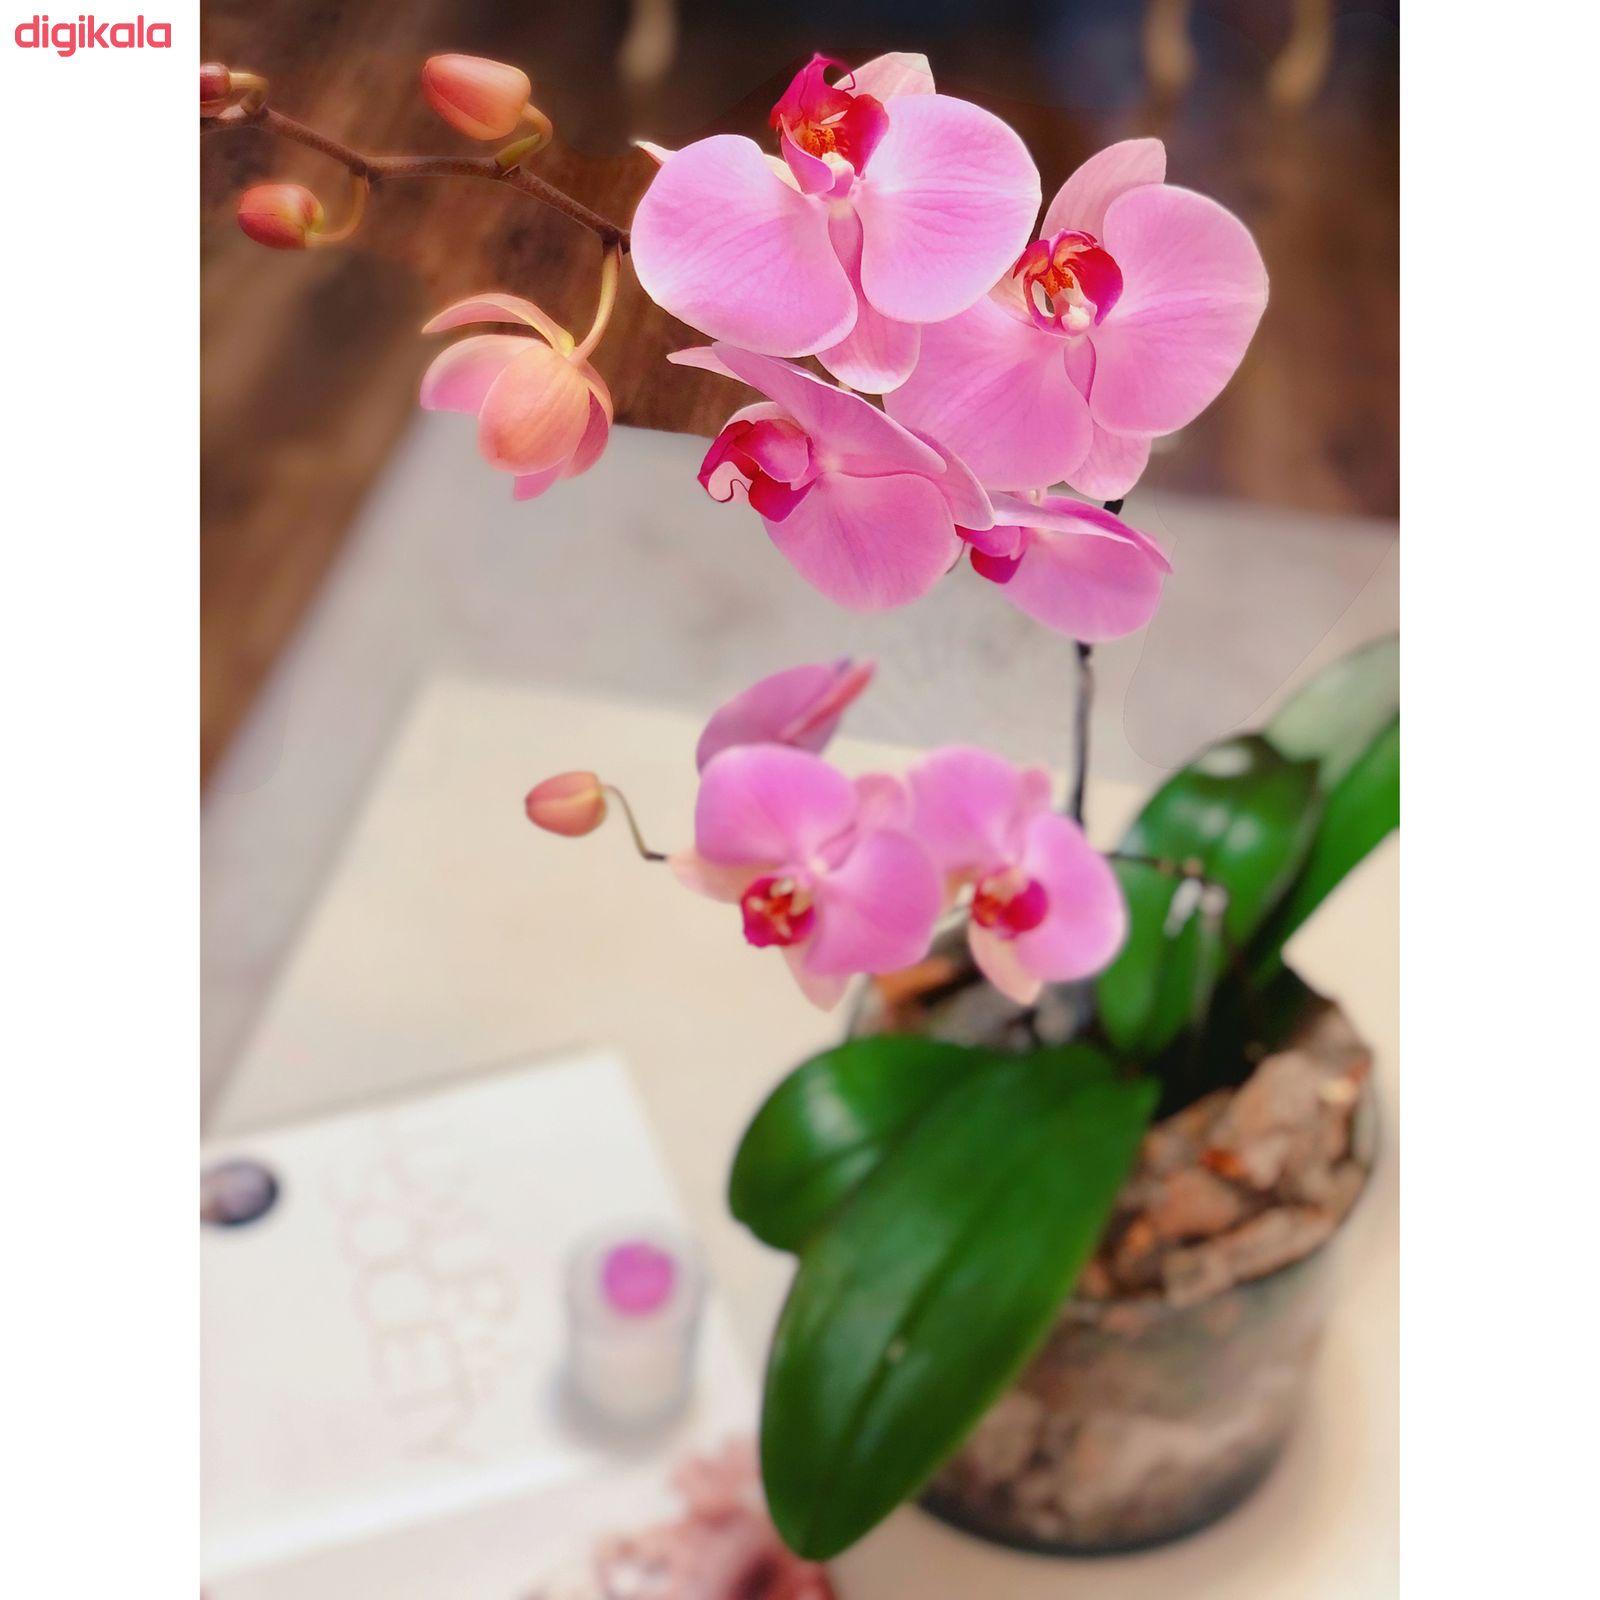 گیاه طبیعی ارکیده صورتی گل گیفت کد GP009 main 1 3